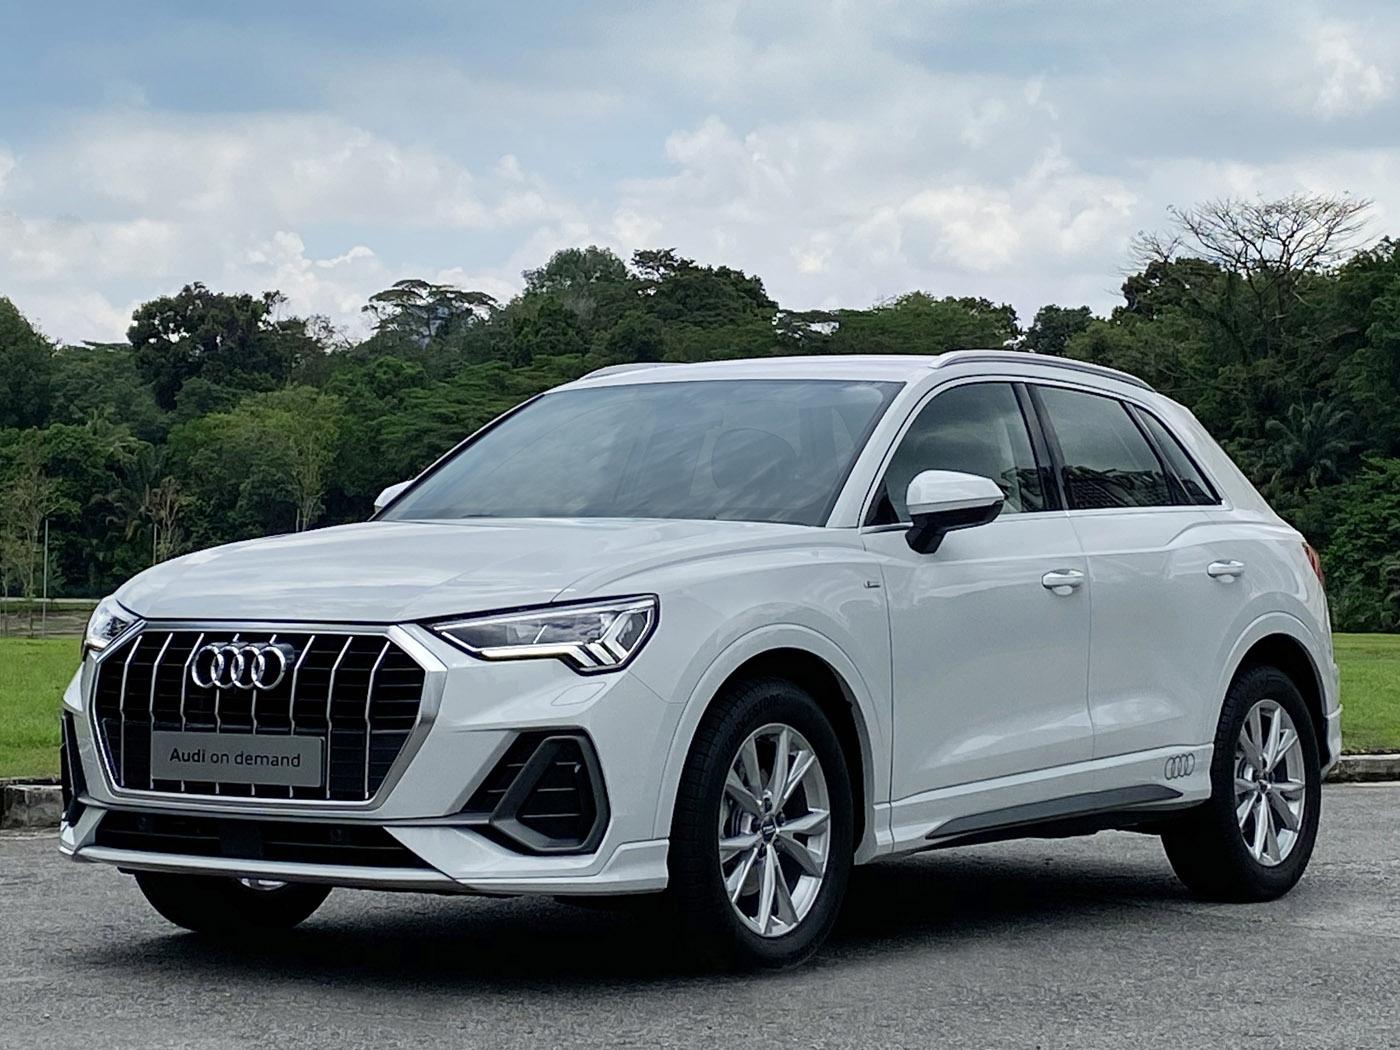 Audi Q3 (S line) 1.4 TFSI S tronic (For Rent)